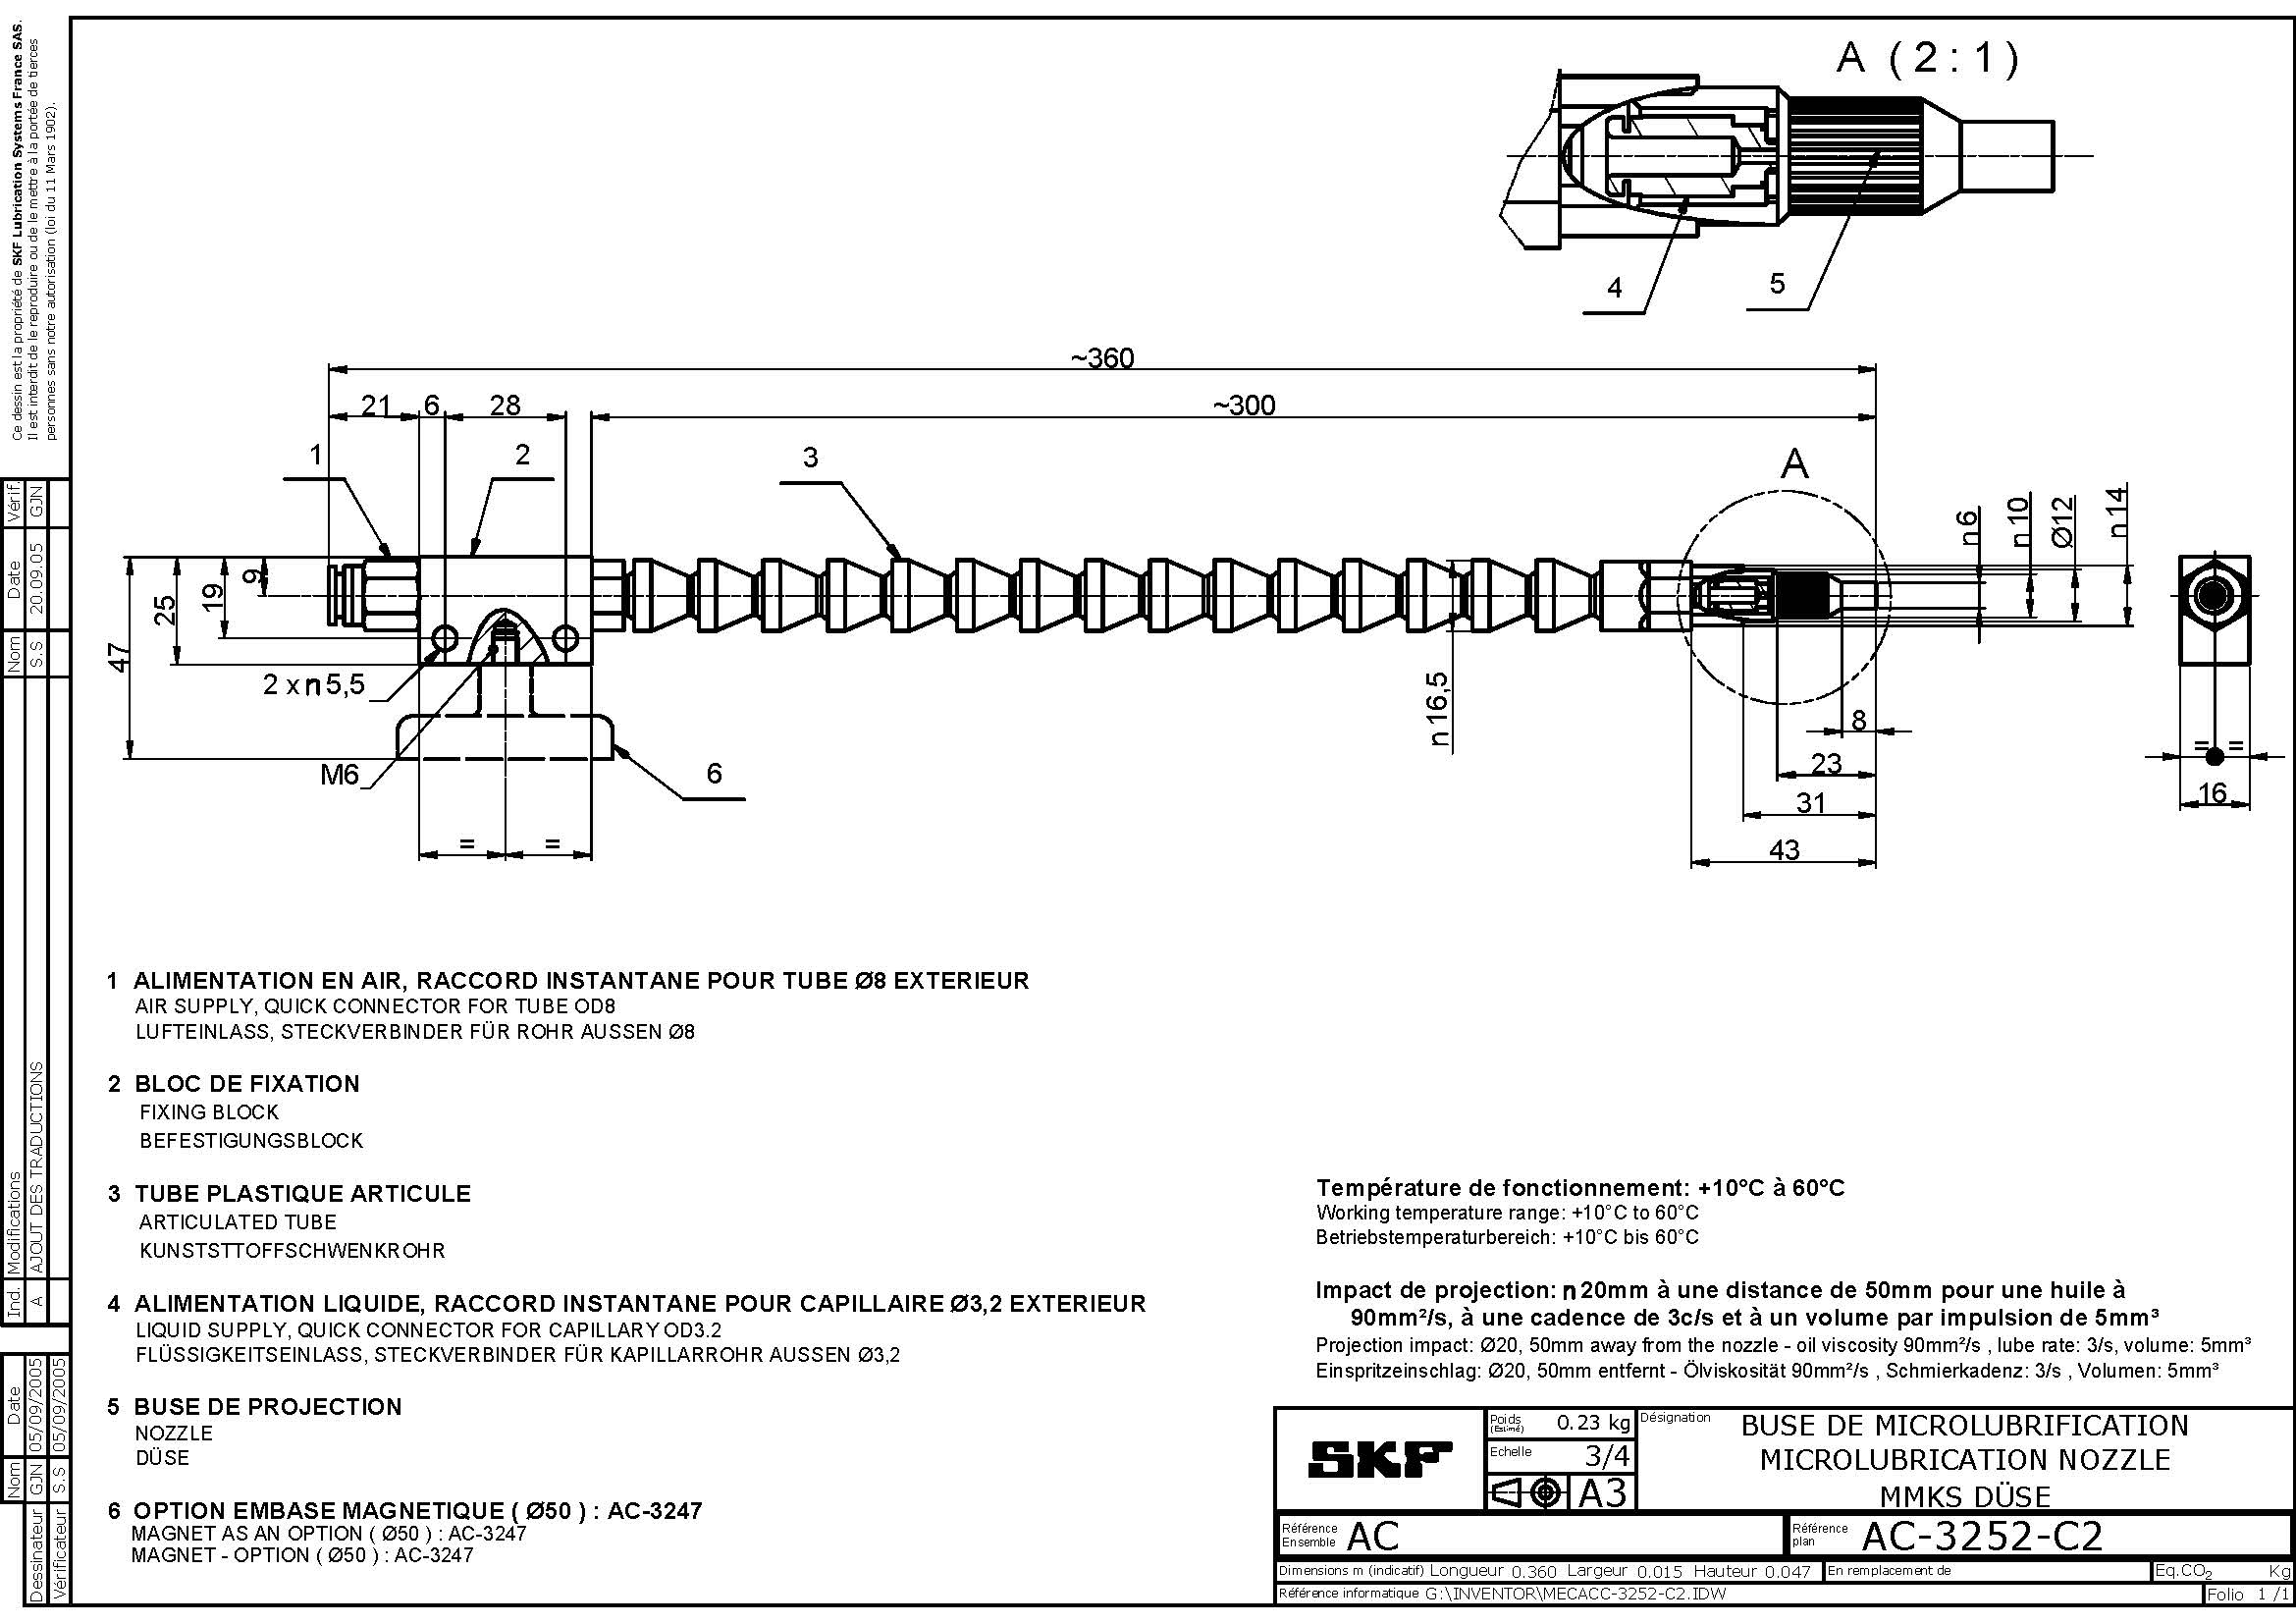 AC-3252-C2.jpg